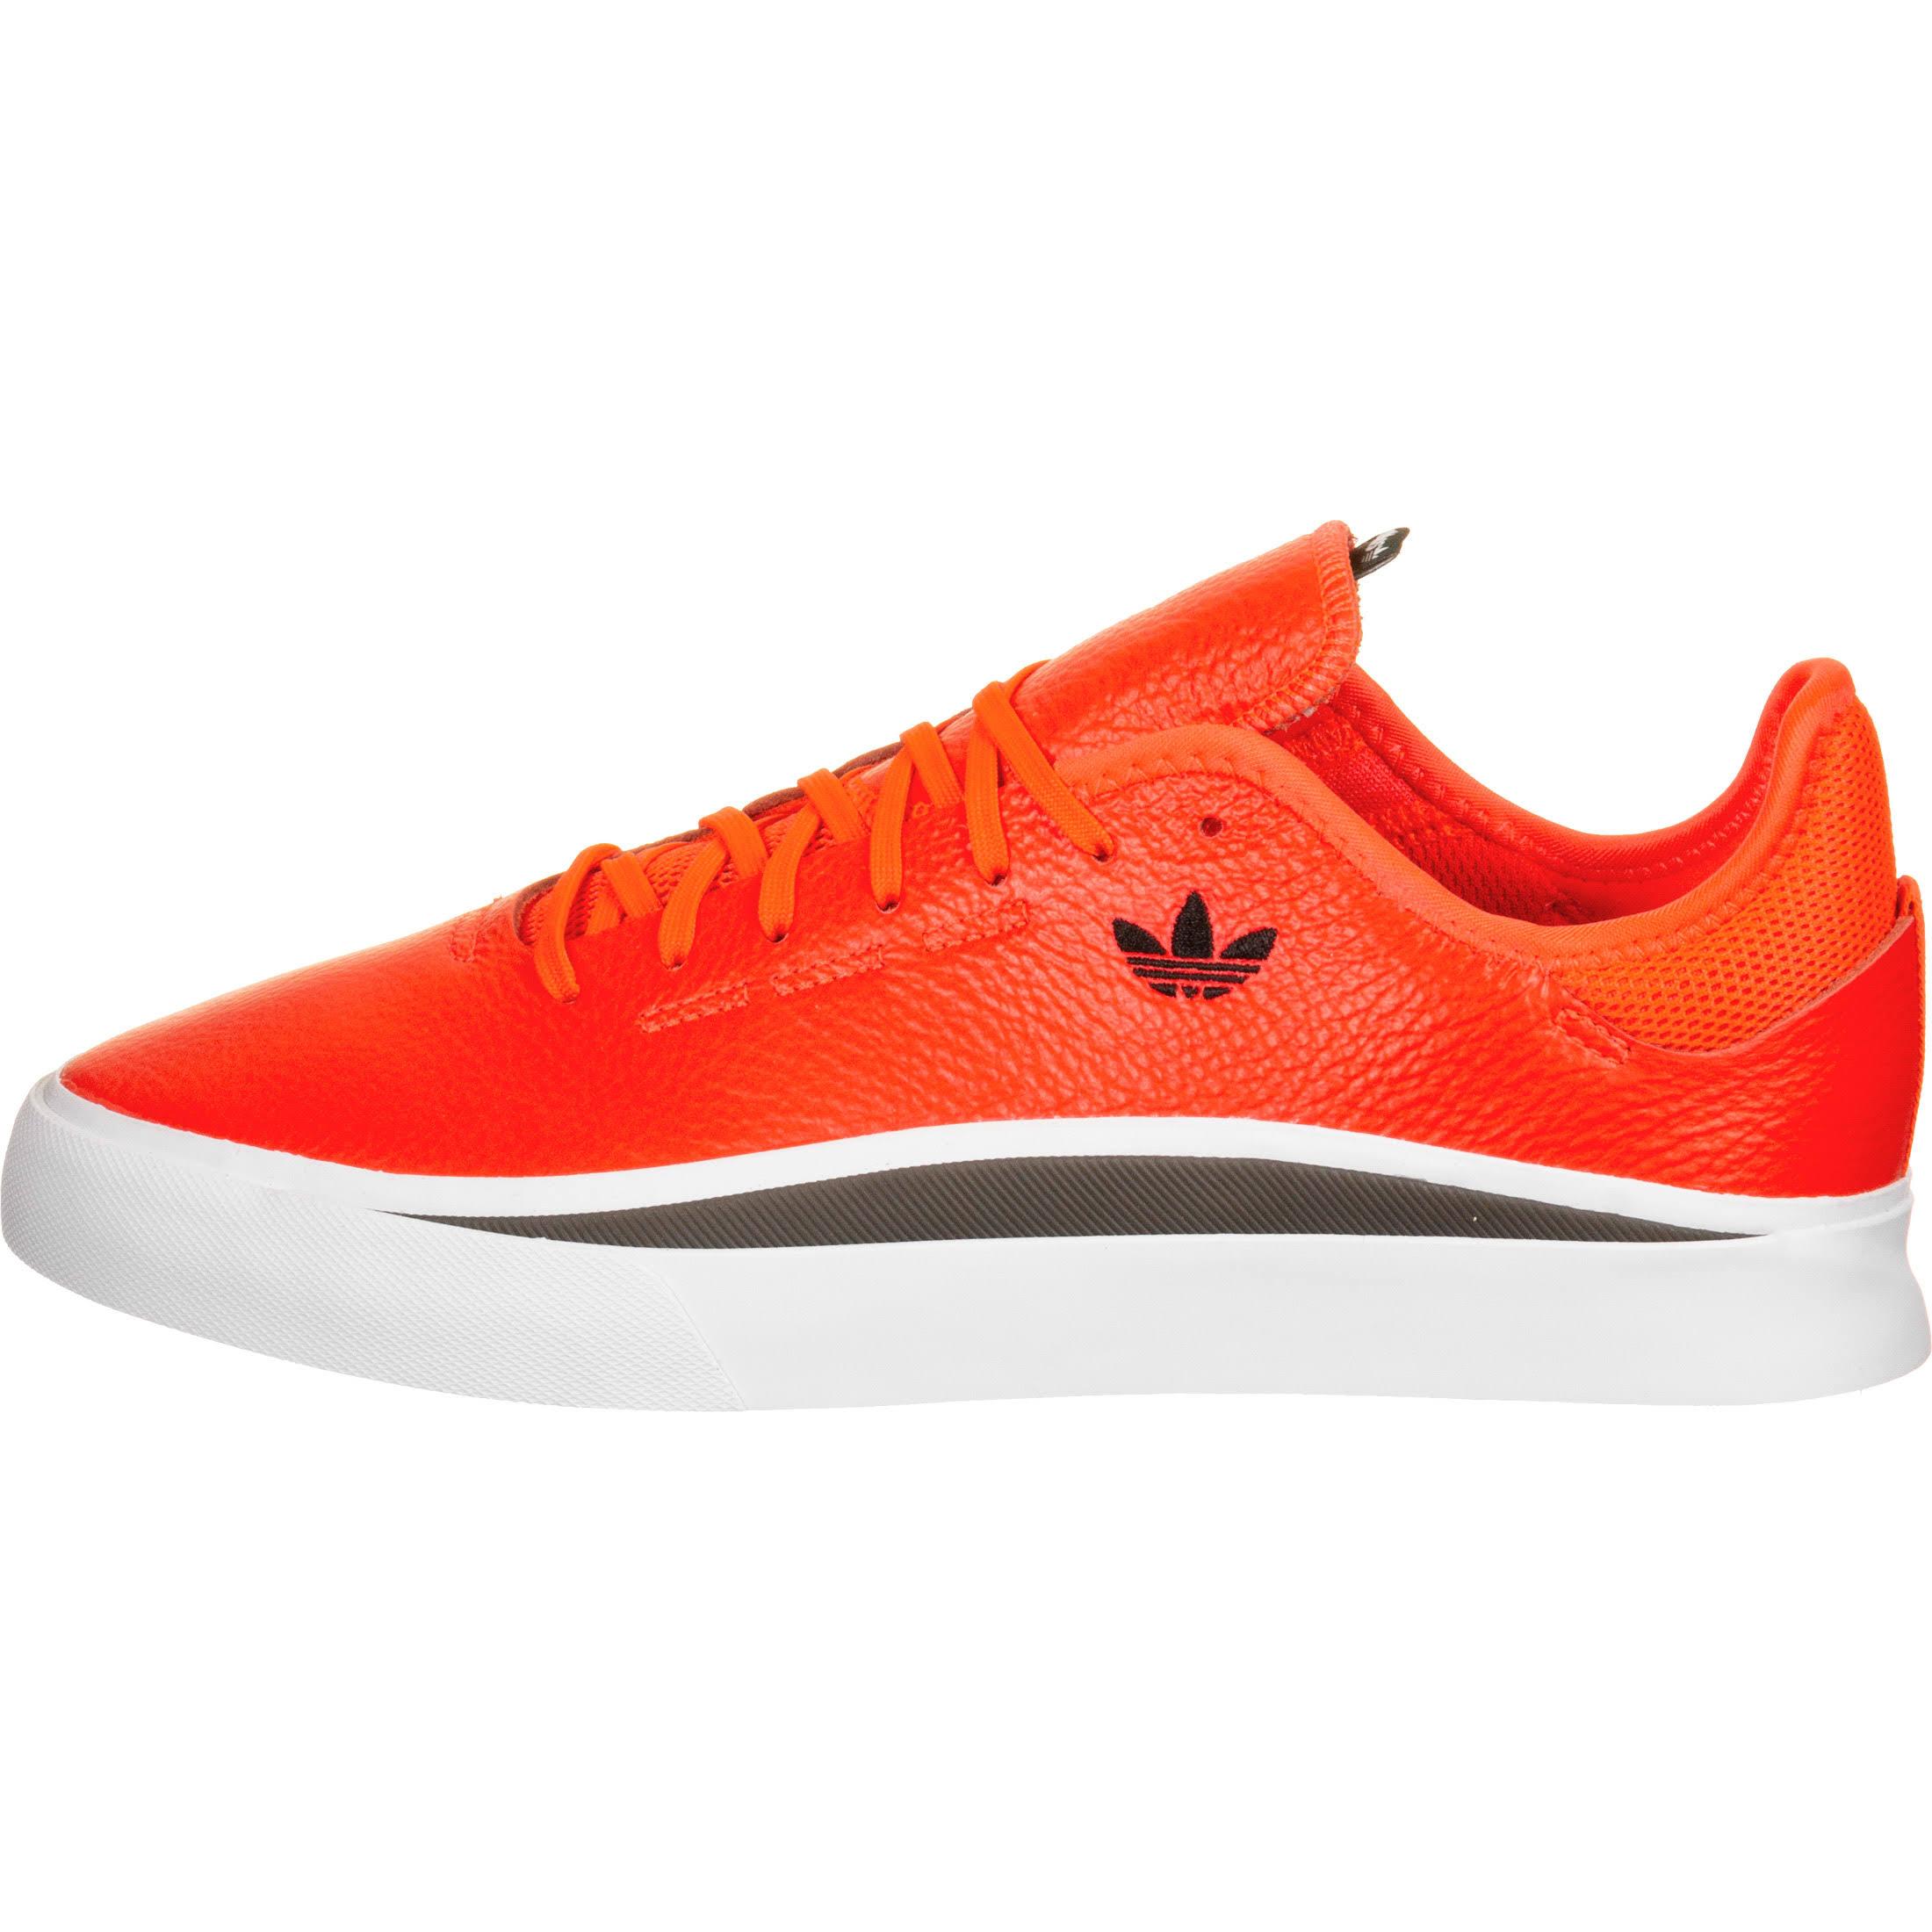 Adidas Sabalo Shoes - Womens - Red